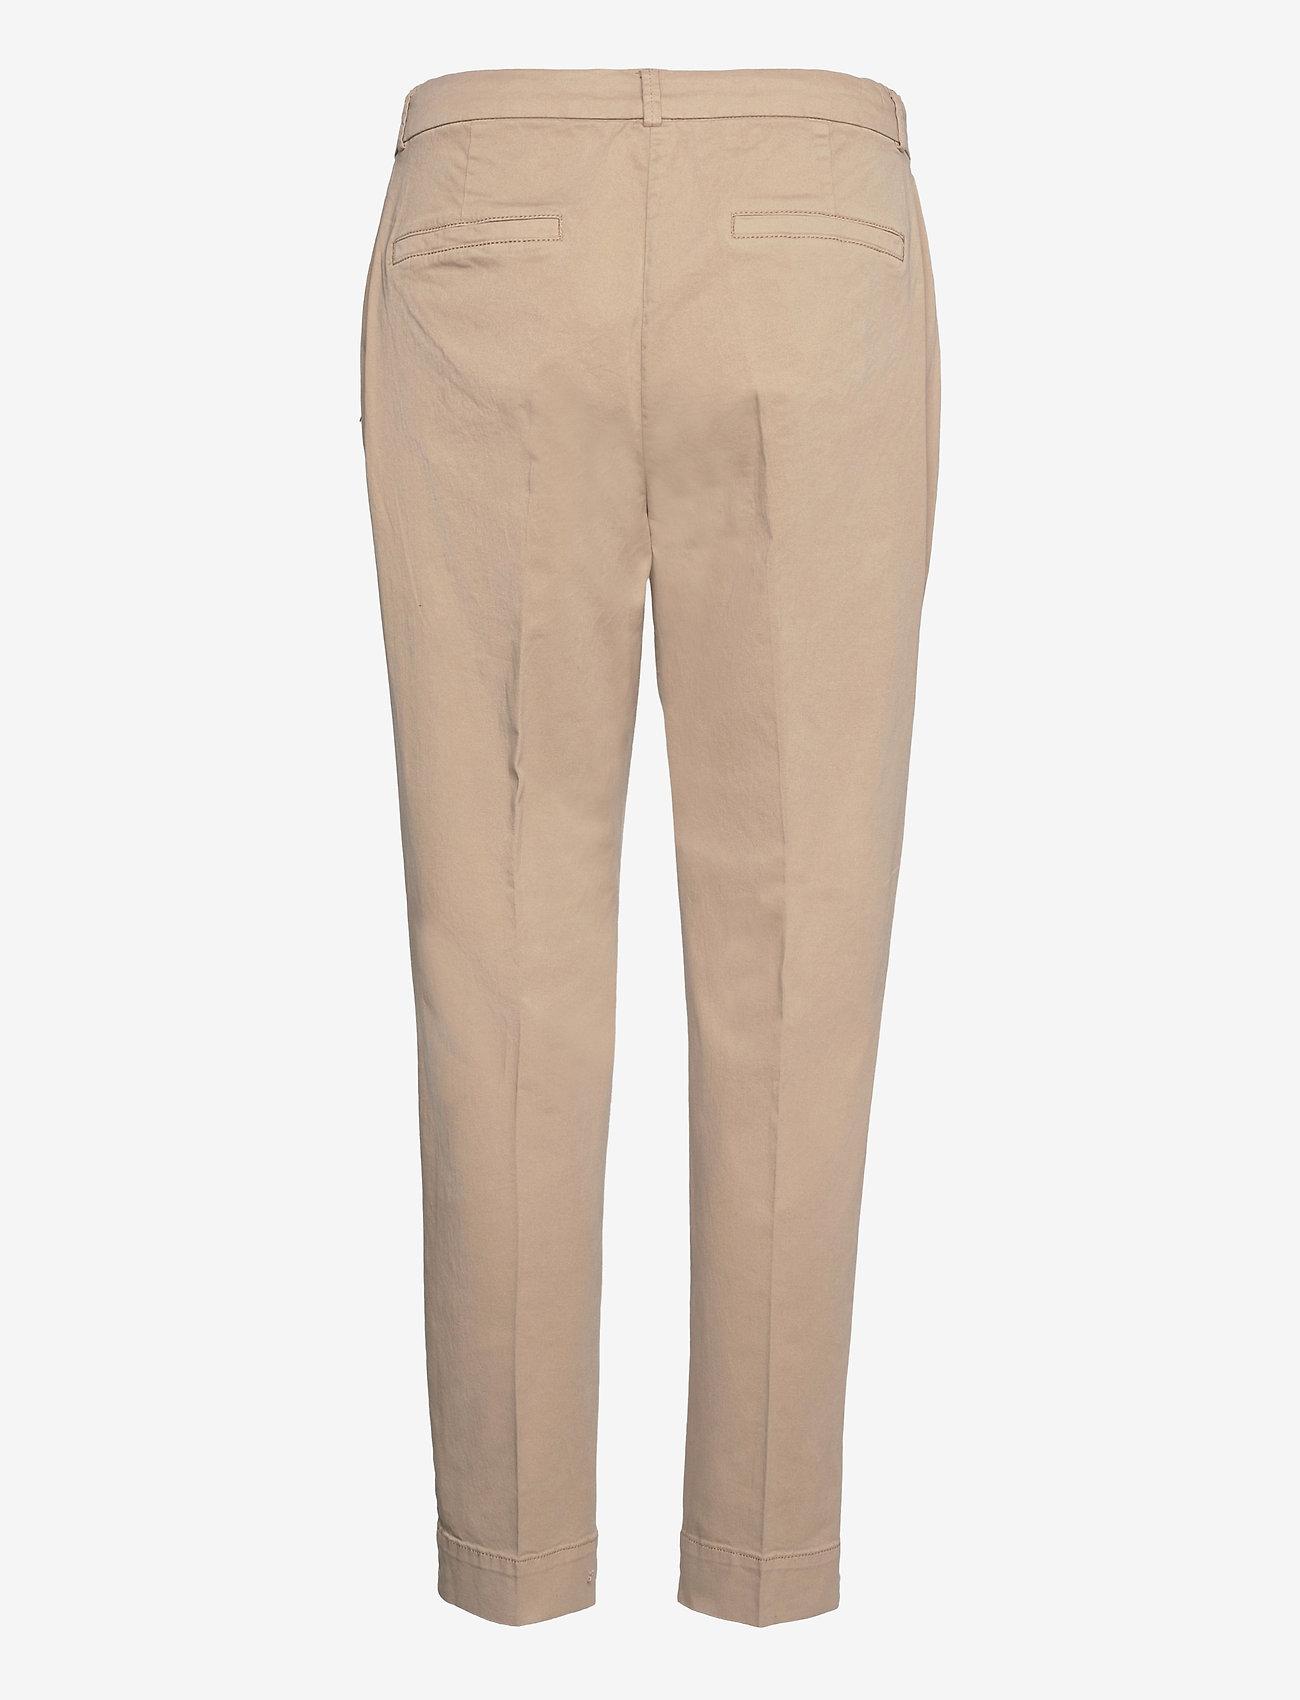 Coster Copenhagen - Chino pants w. press fold and paspe - chinos - khaki - 1